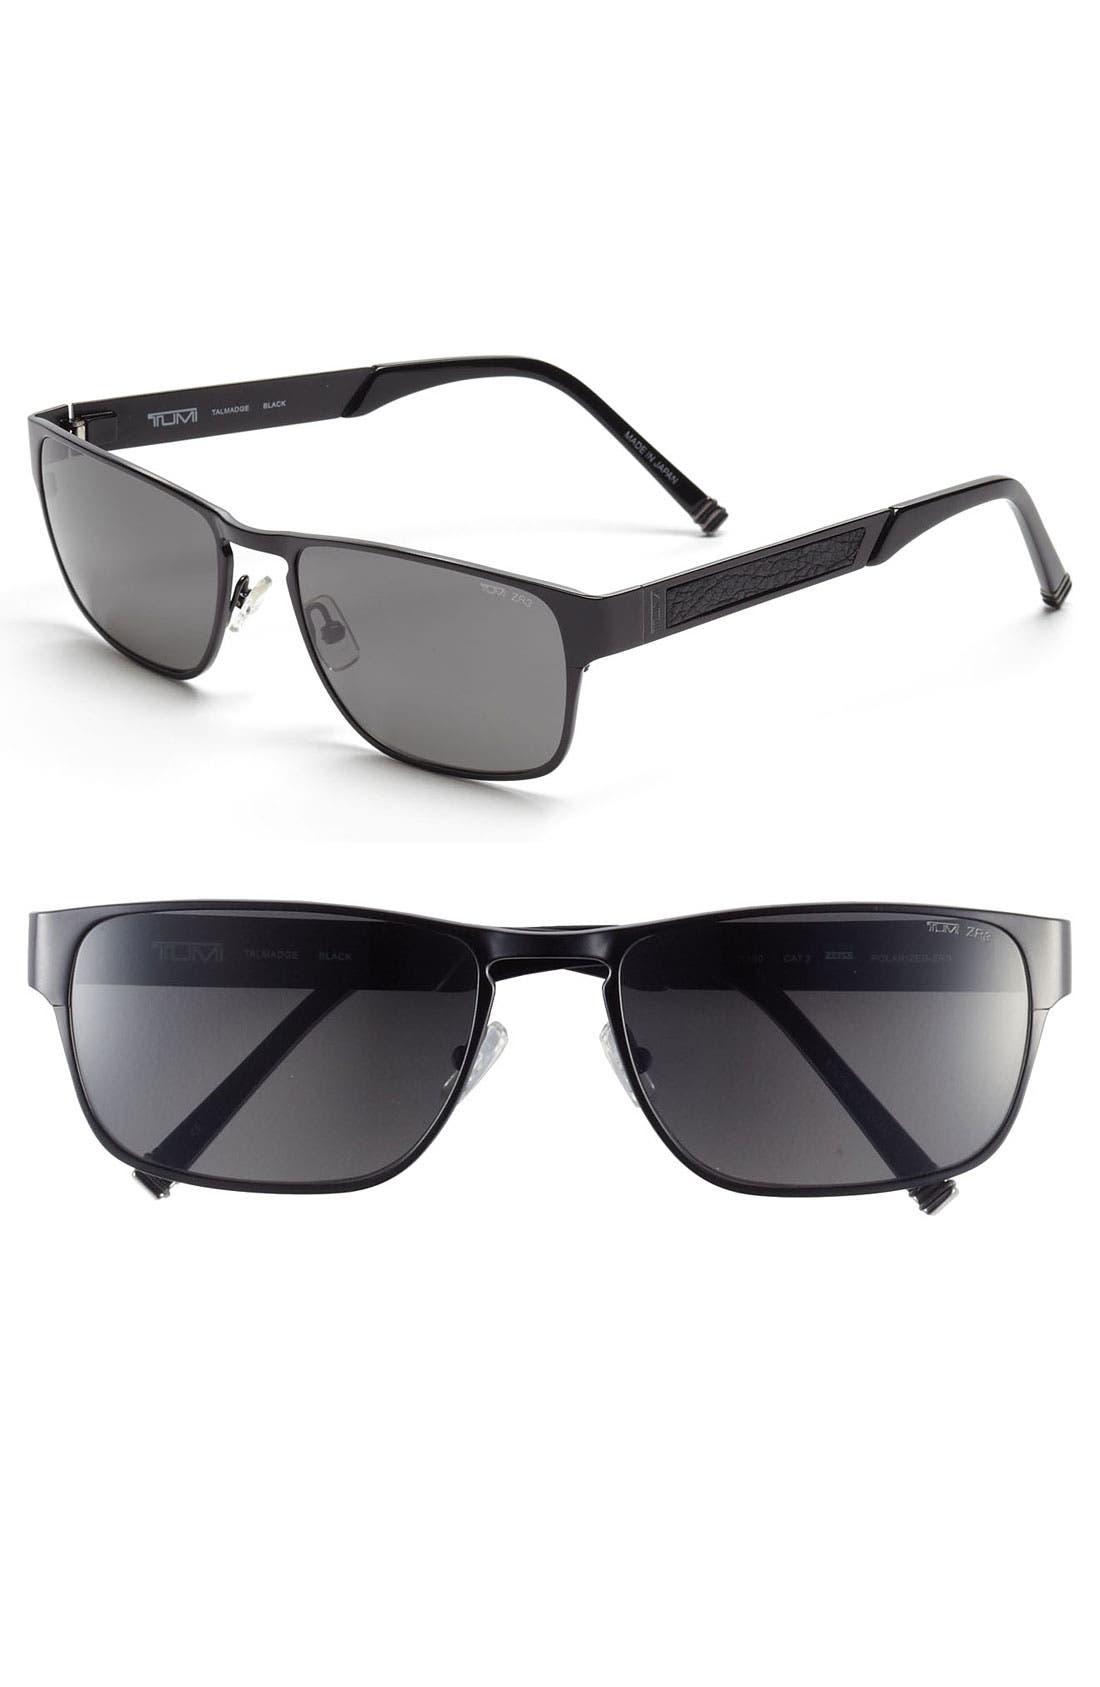 Main Image - Tumi 'Talmadge' 57mm Polarized Sunglasses